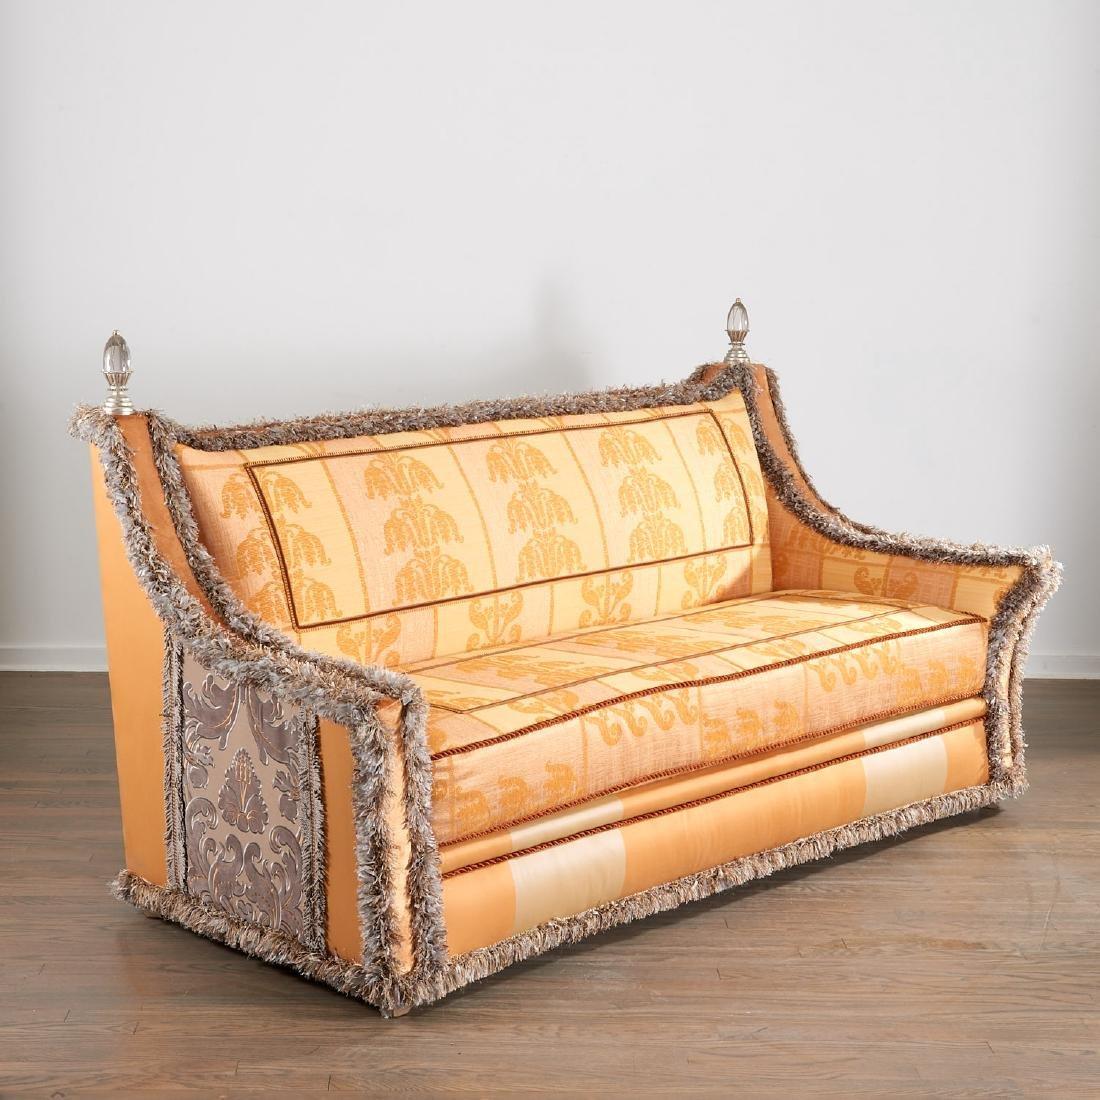 Extravagant custom upholstered sofa